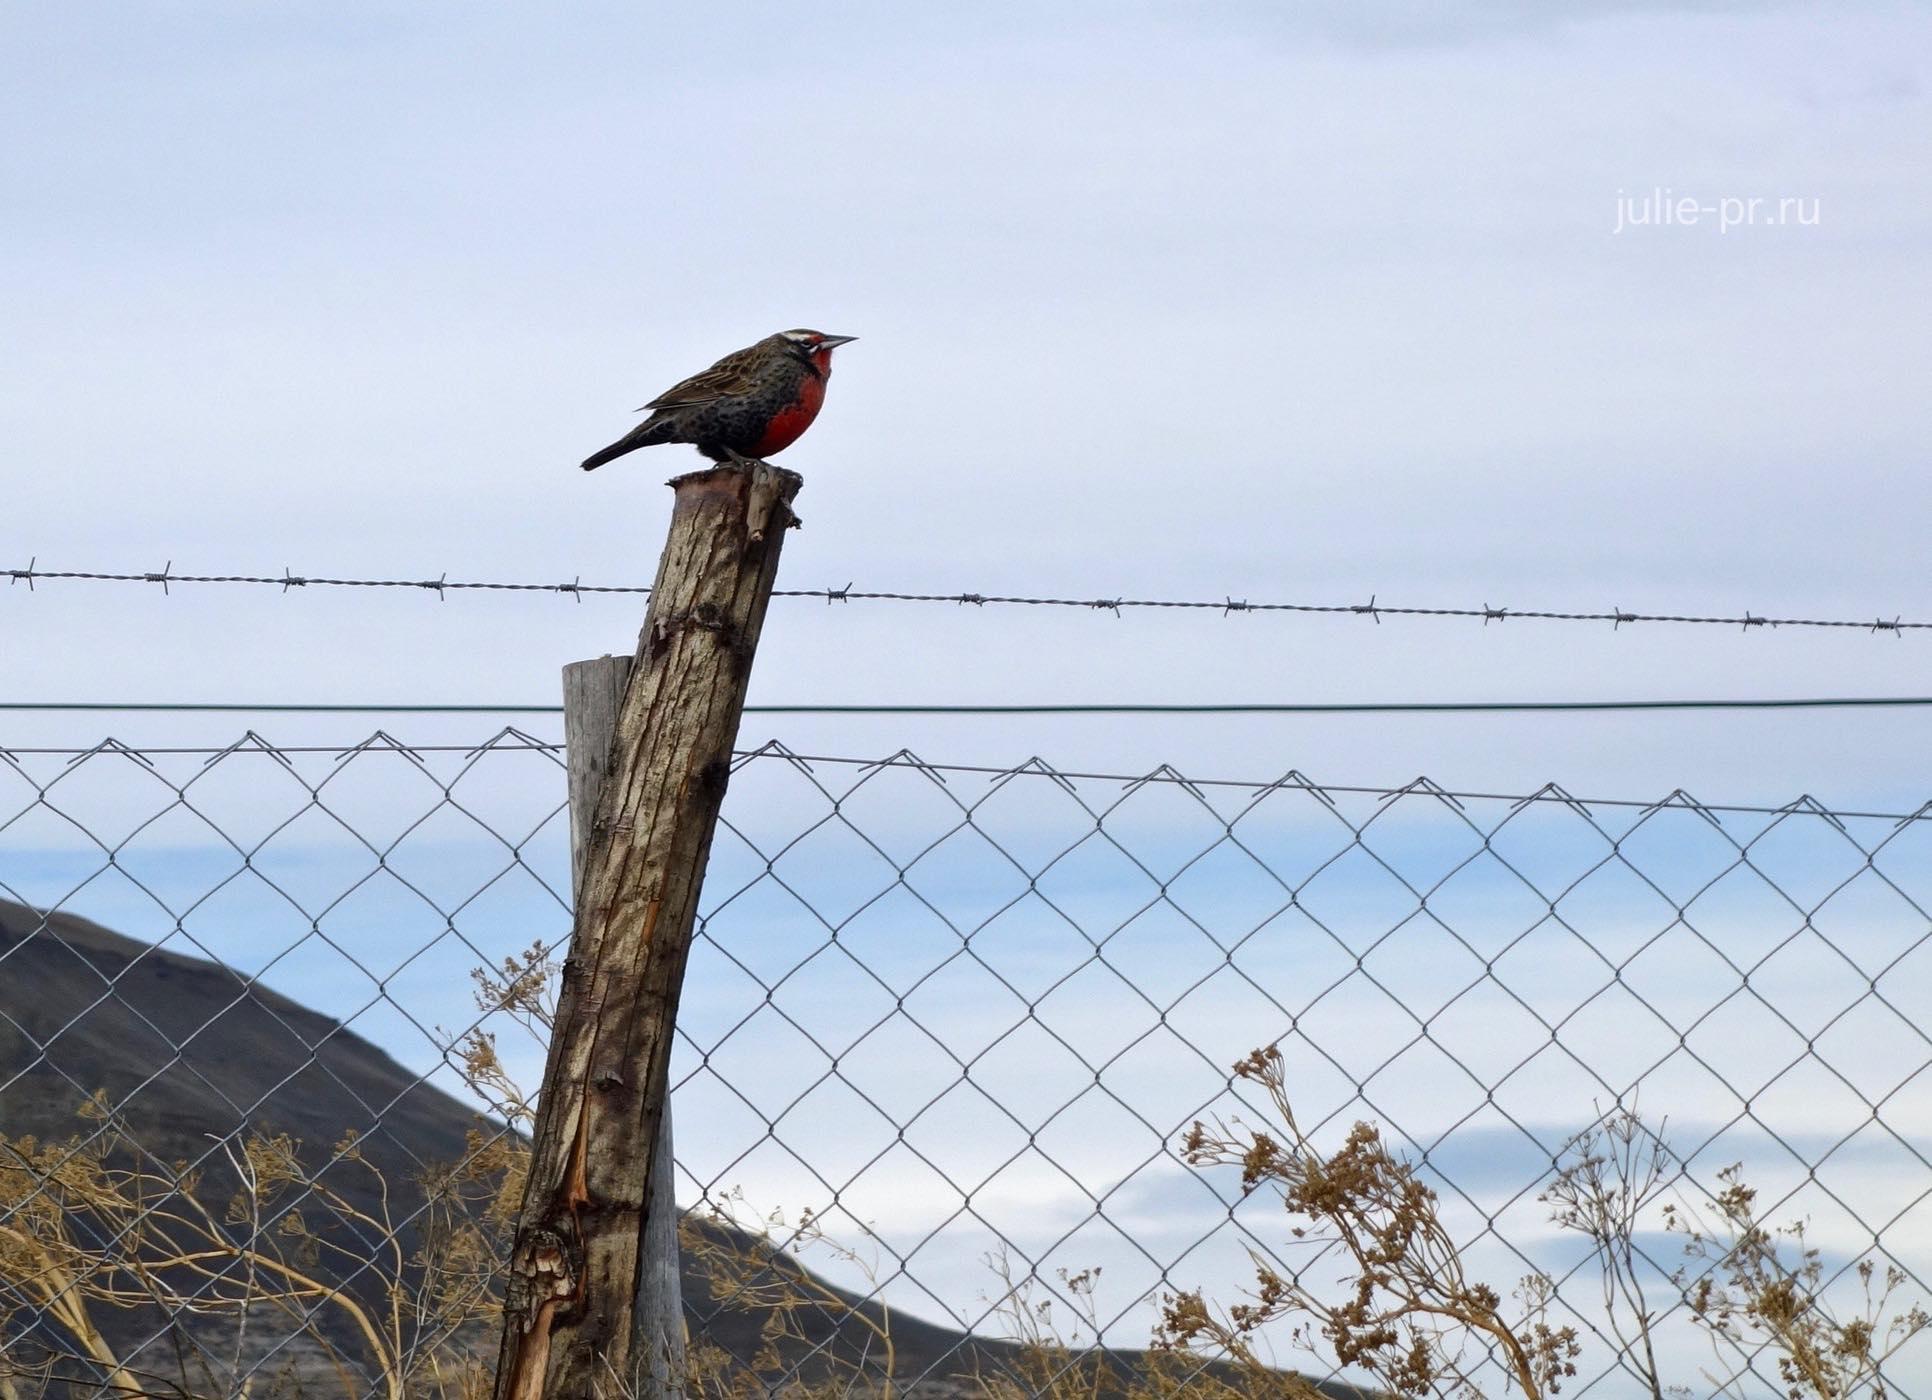 Аргентина, Патагония, Эль-Калафате, лагуна Нимез, птица, трупиал